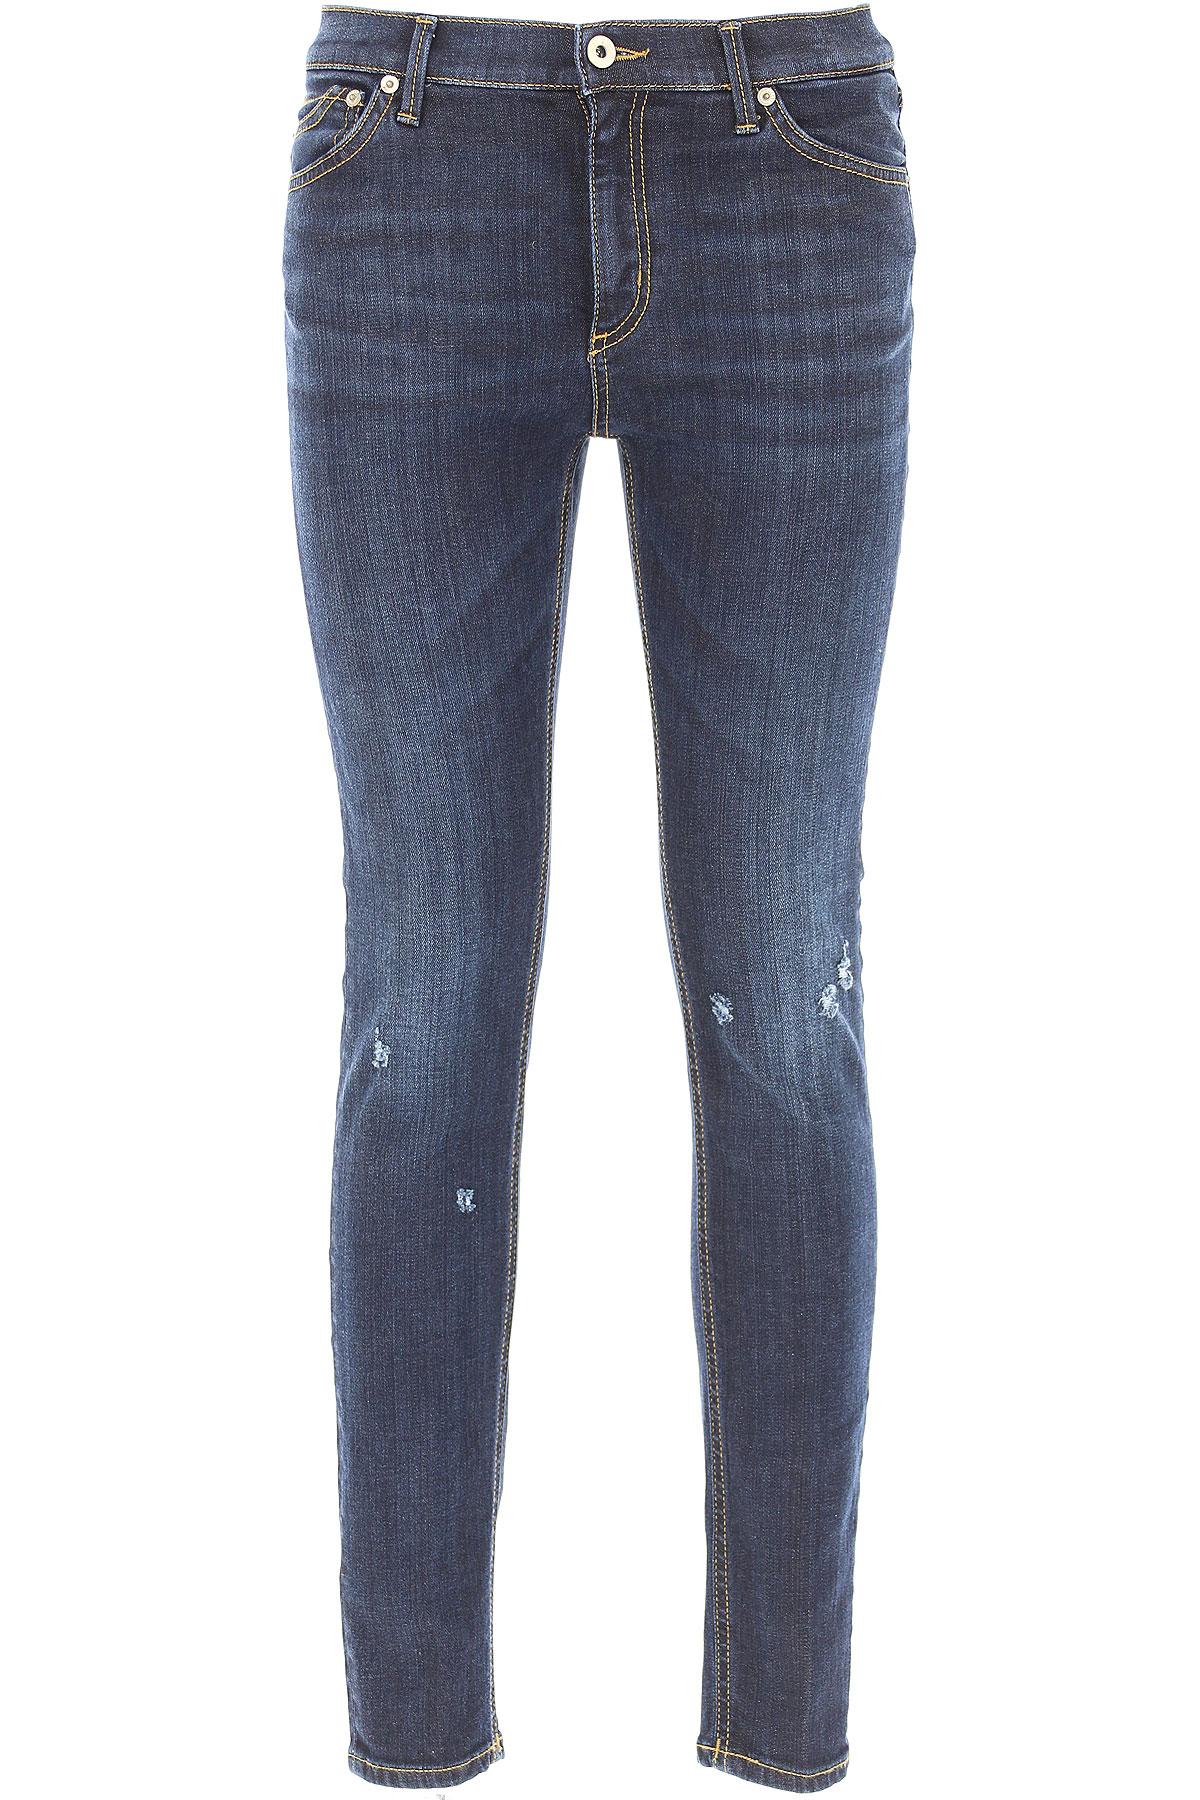 Dondup Jeans On Sale, Denim, Cotton, 2017, 28 29 30